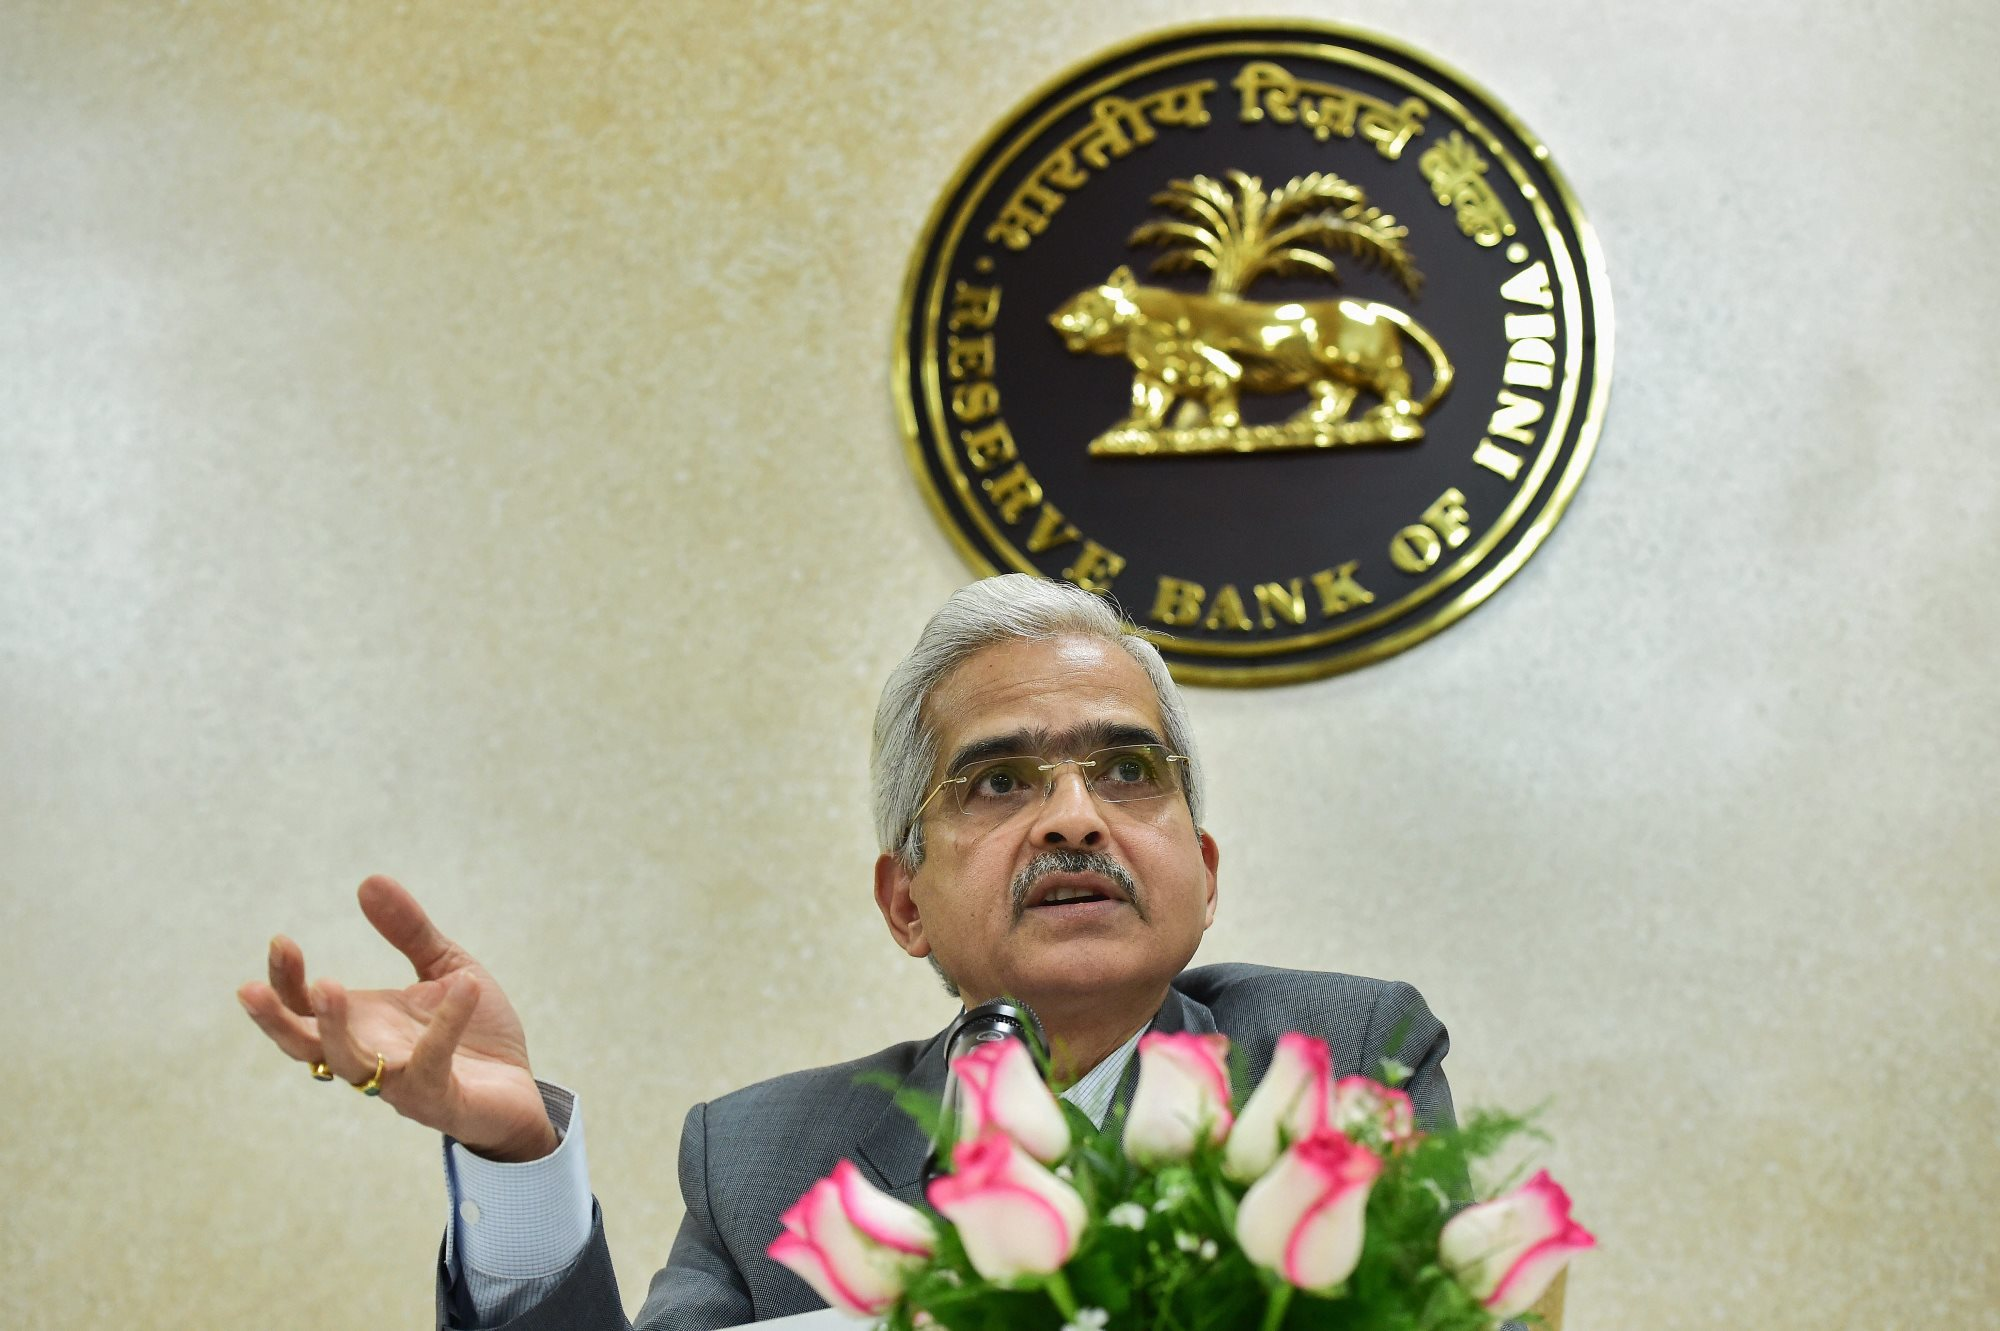 New Delhi: Reserve Bank of India Governor Shaktikanta Das interacts with the media at the RBI office, in New Delhi, Monday, Jan. 7, 2019.(PTI Photo/ Manvender Vashist) (PTI1_7_2019_000090B)